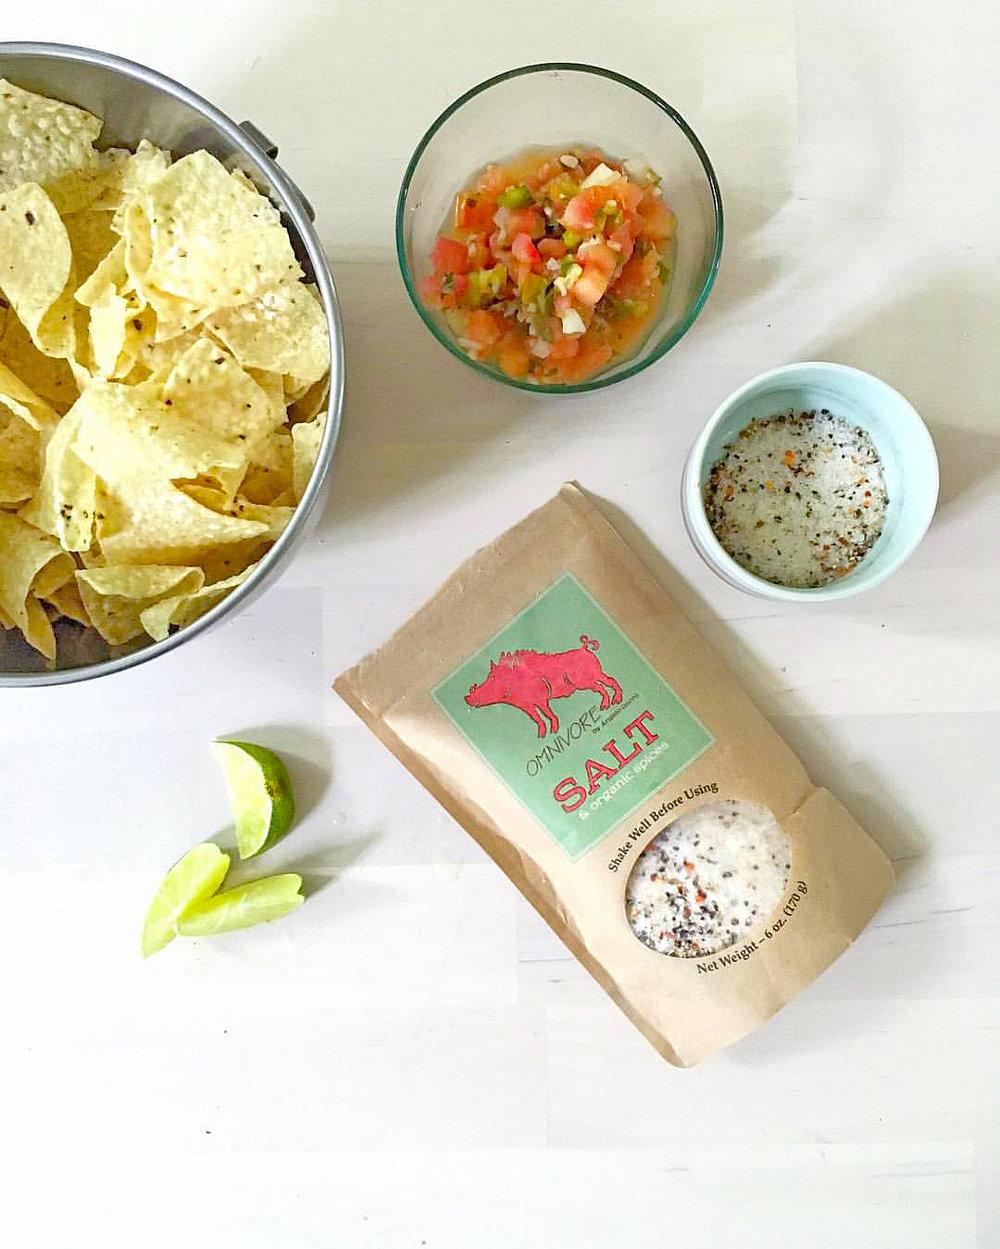 Flavored Organic Salt